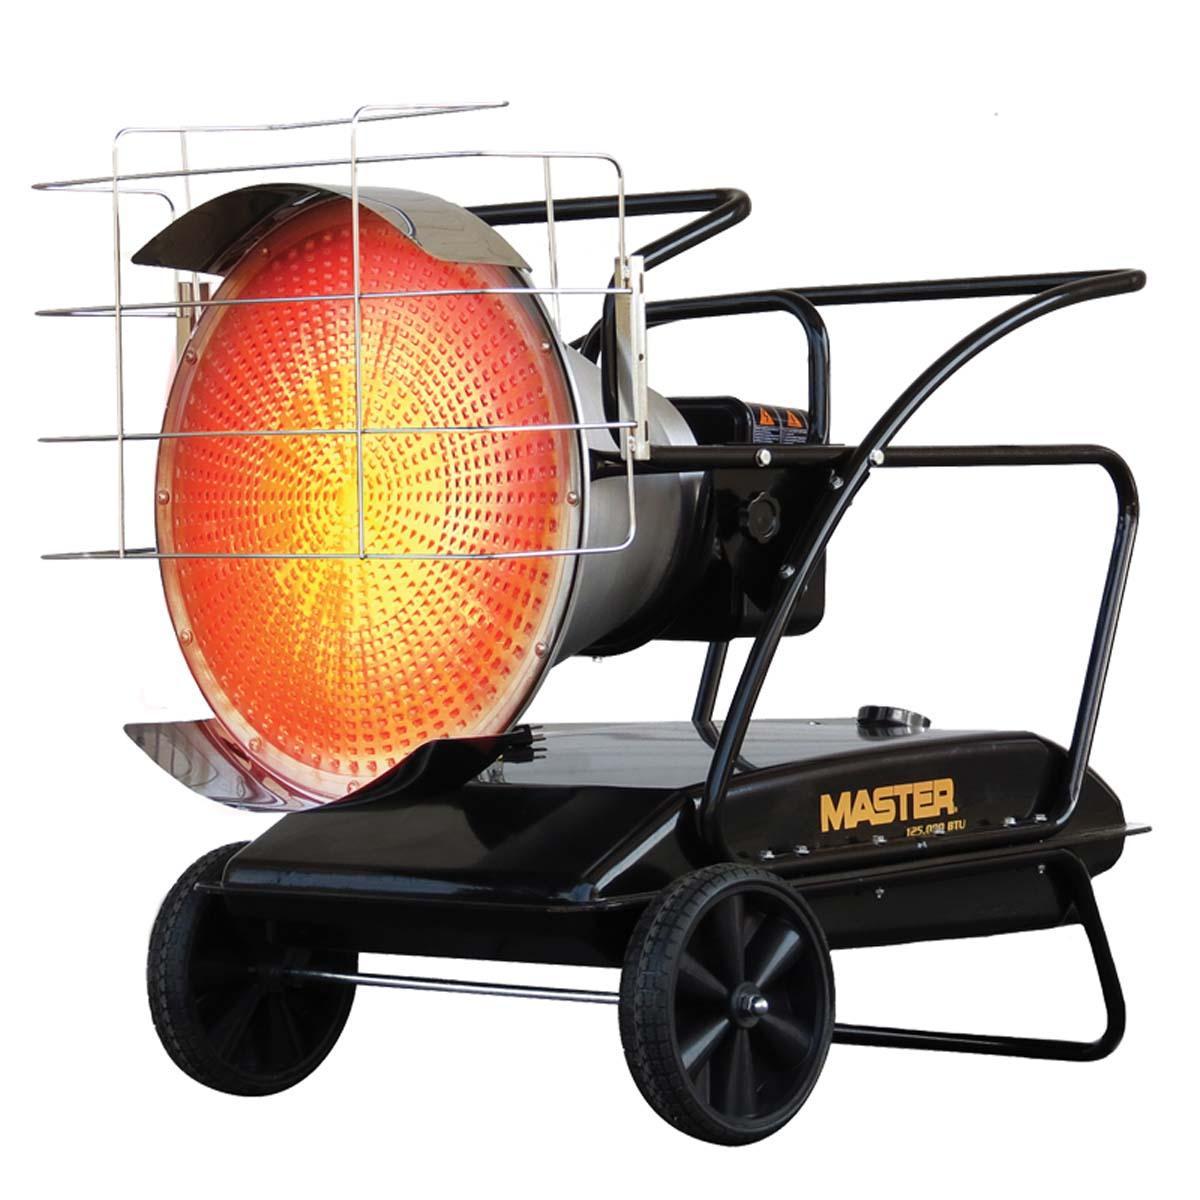 MASTER 125,000 BTU Kerosene/Diesel Radiant Heater